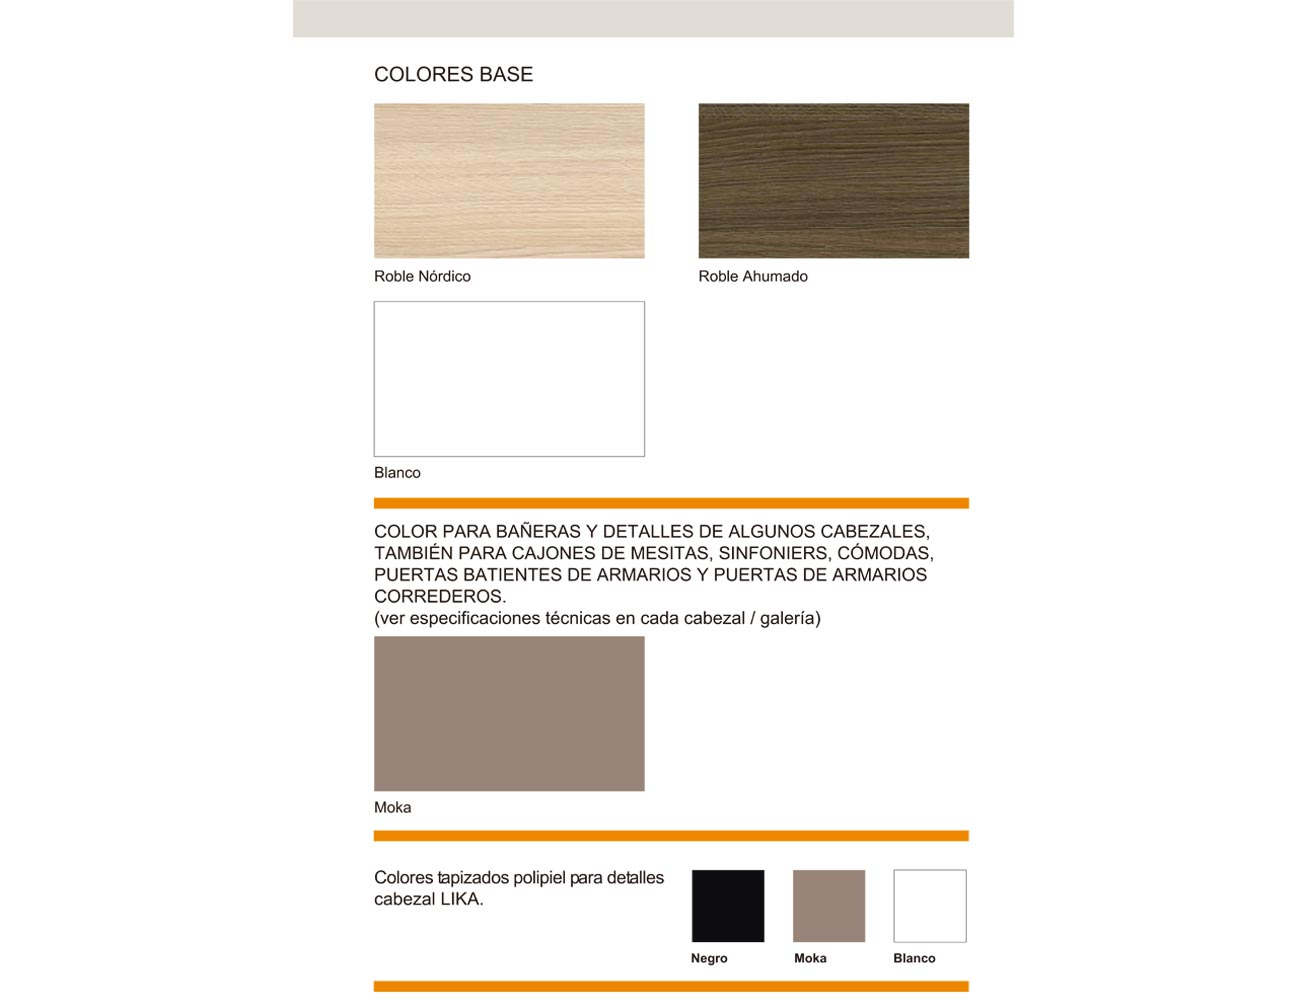 Colores265